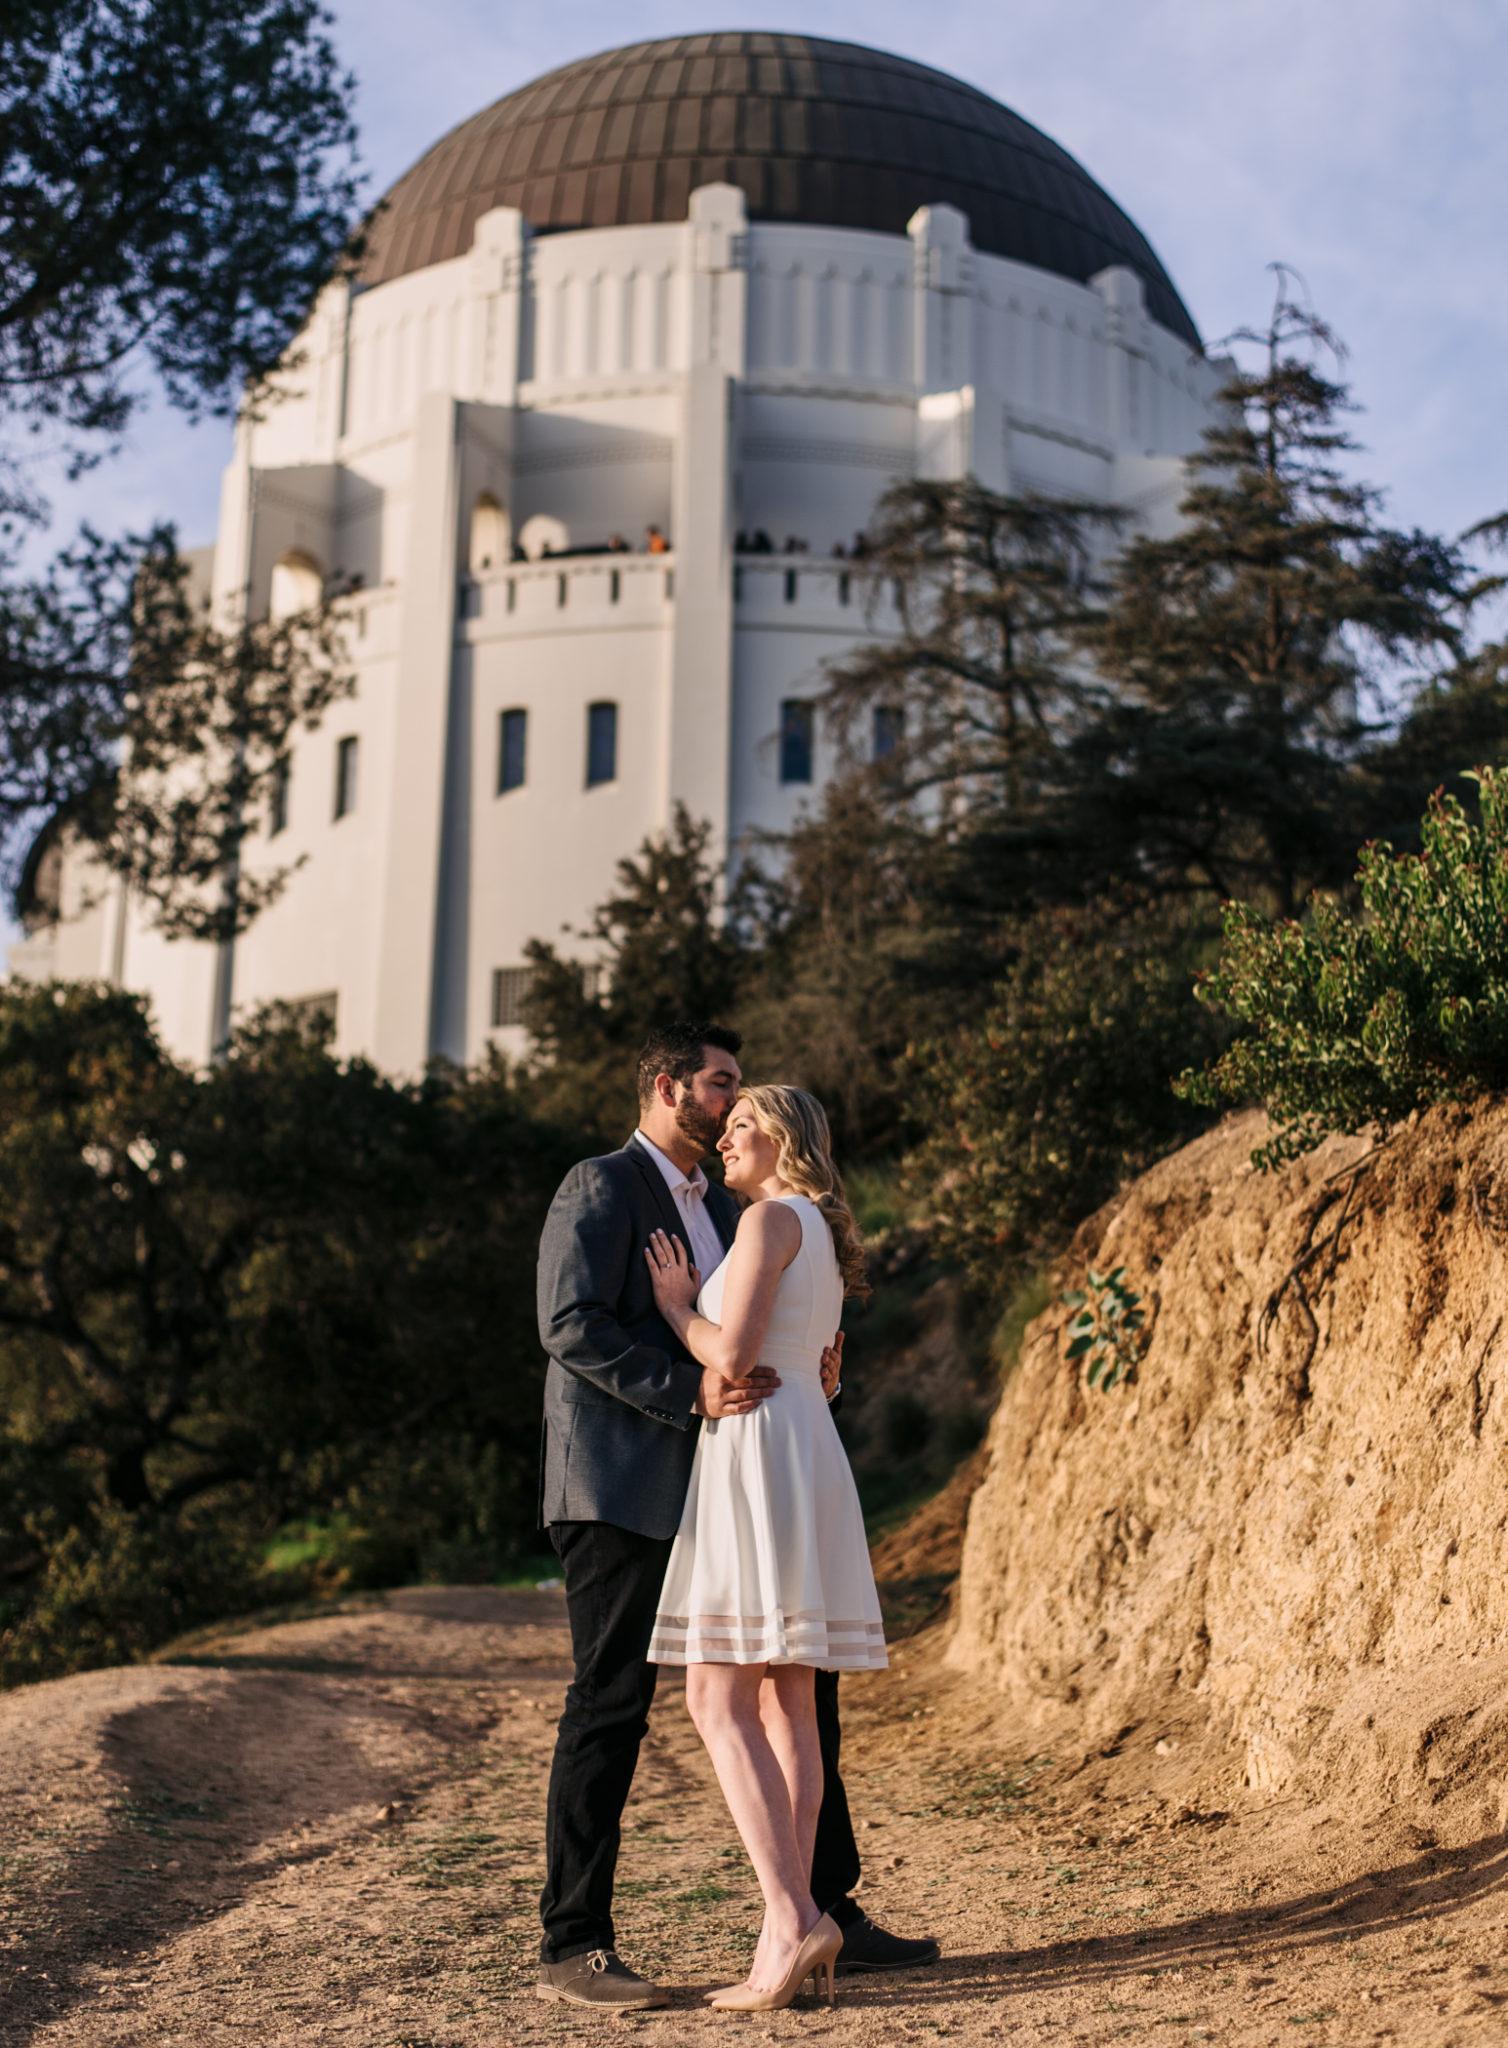 Sunset Portrait - Griffith Observatory engagement session